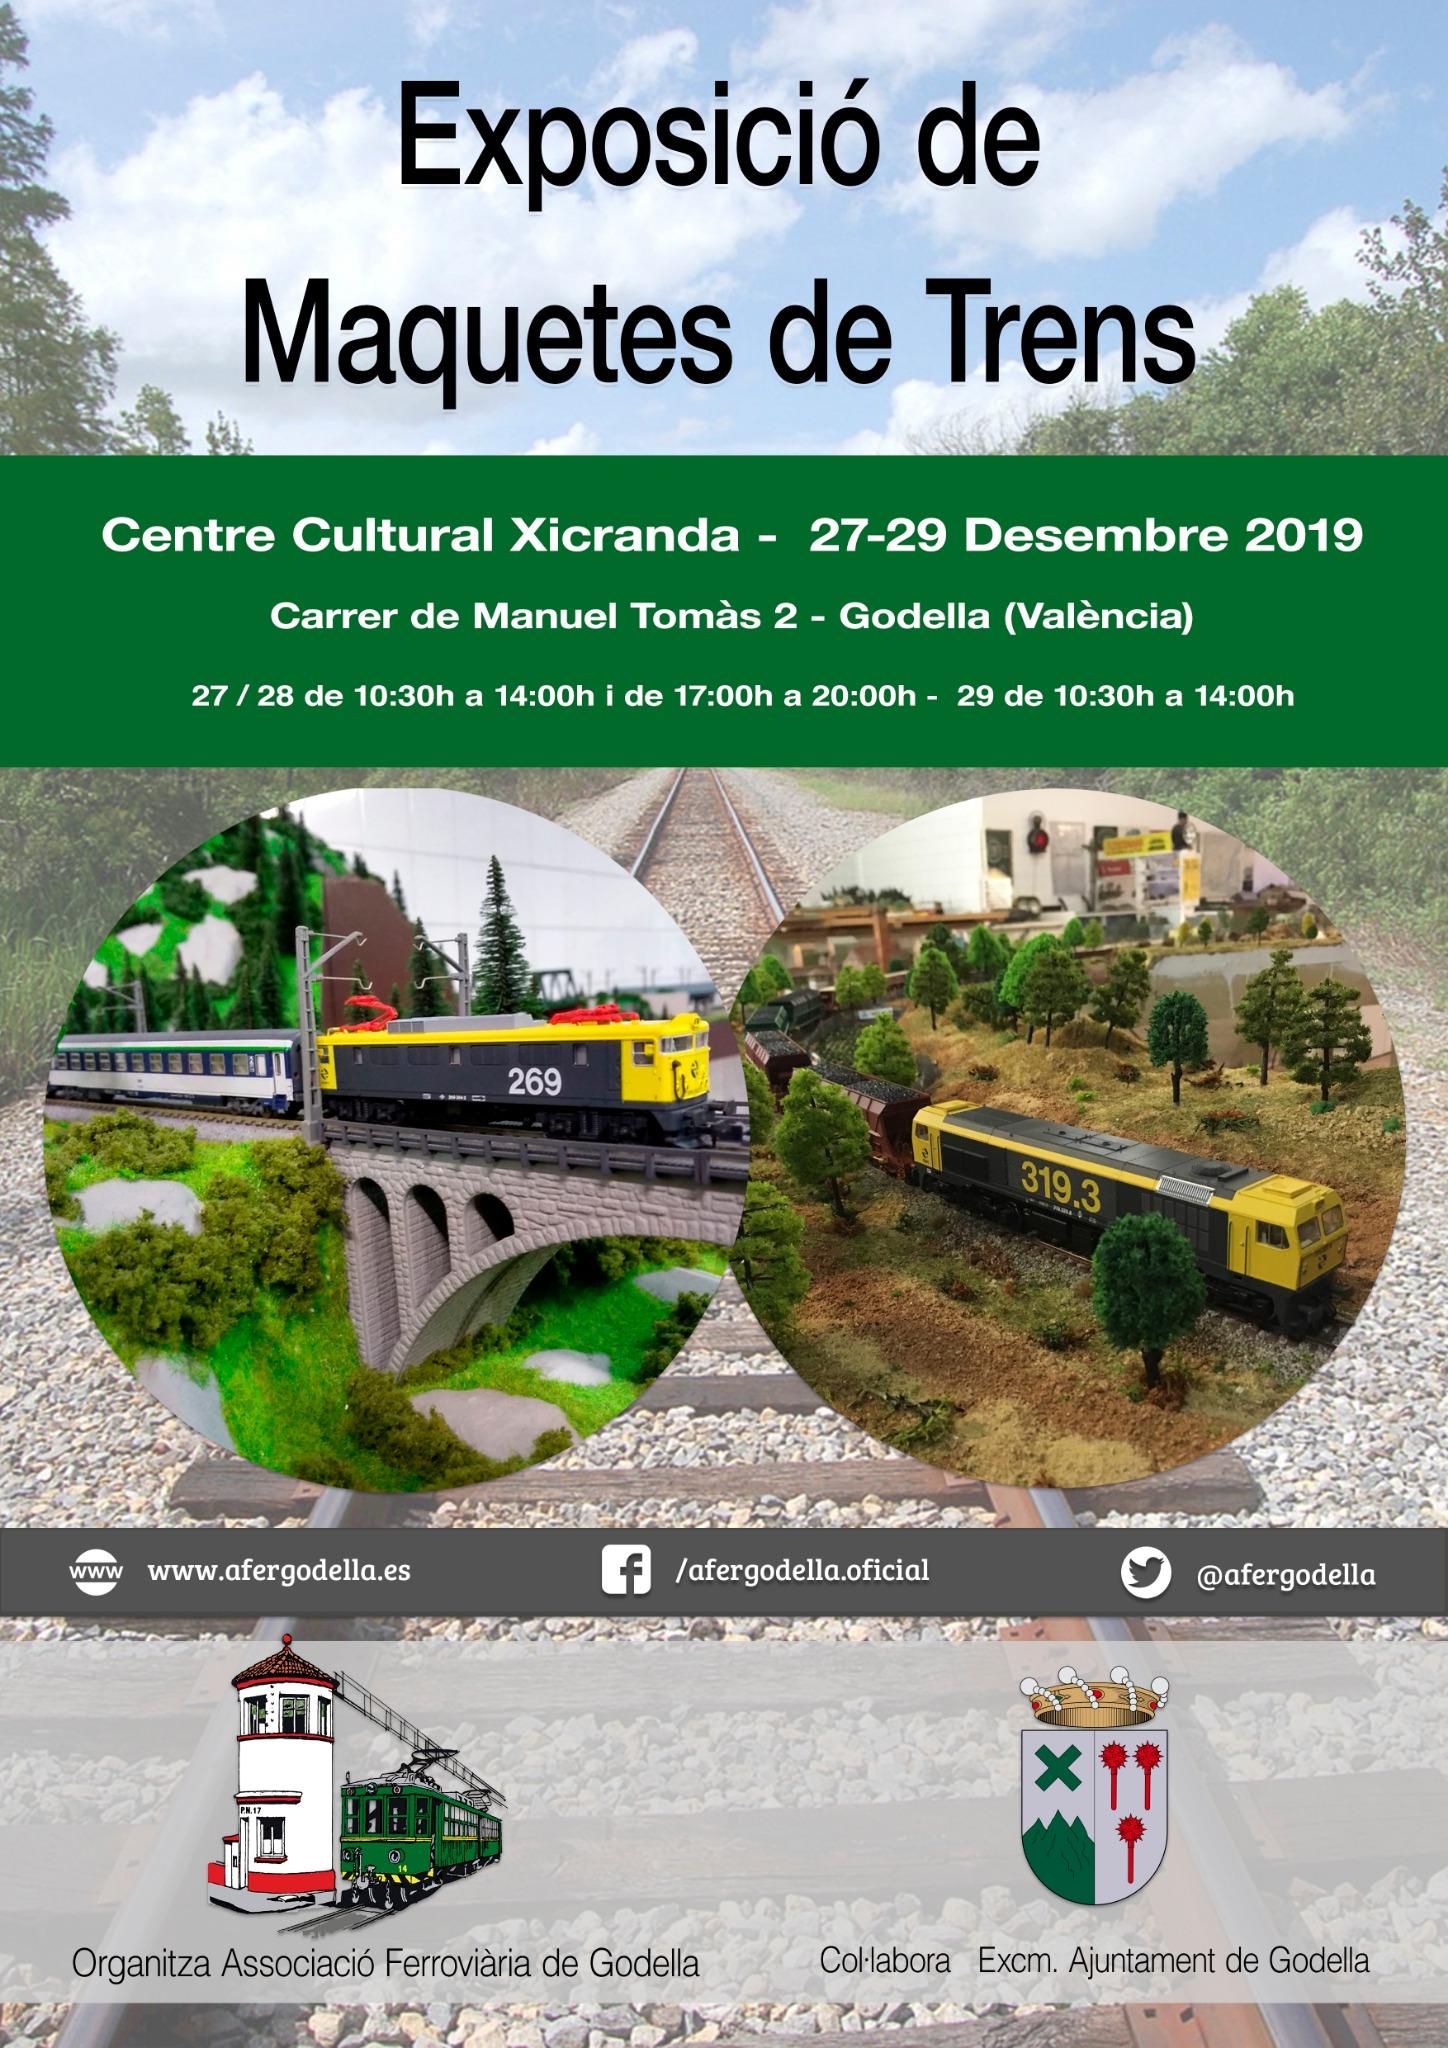 Exhibición de Modelismo Ferrovario - Diciembre de 2019